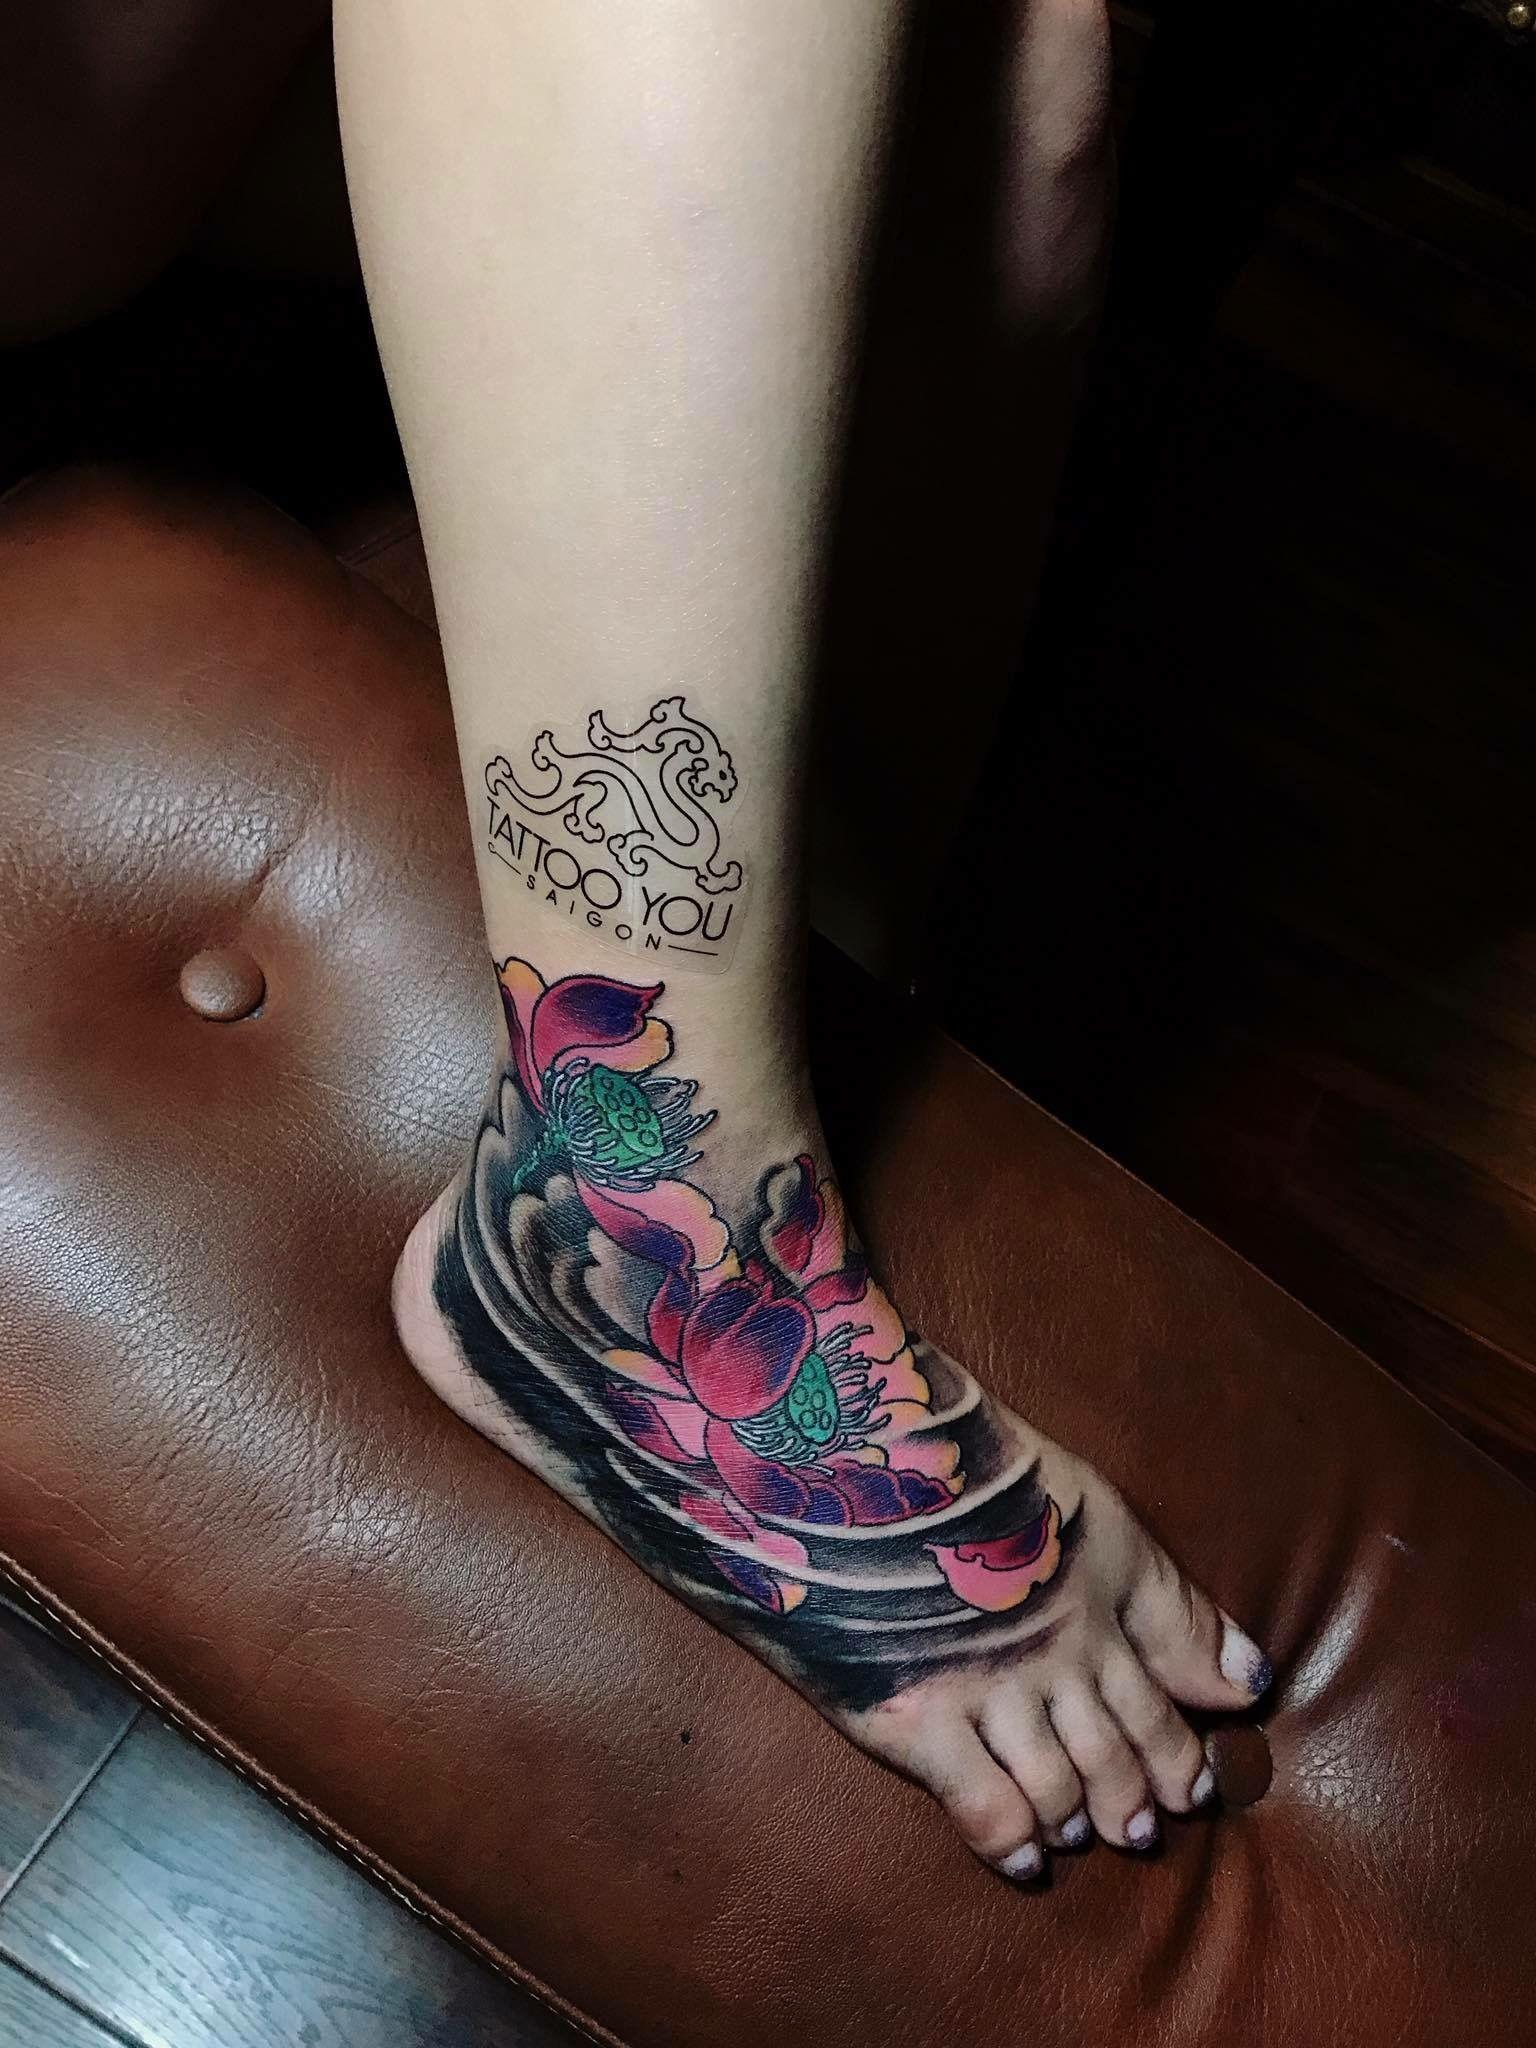 Pin By David Ariza On Japo Pinterest Tattoo Leg Tattoos And